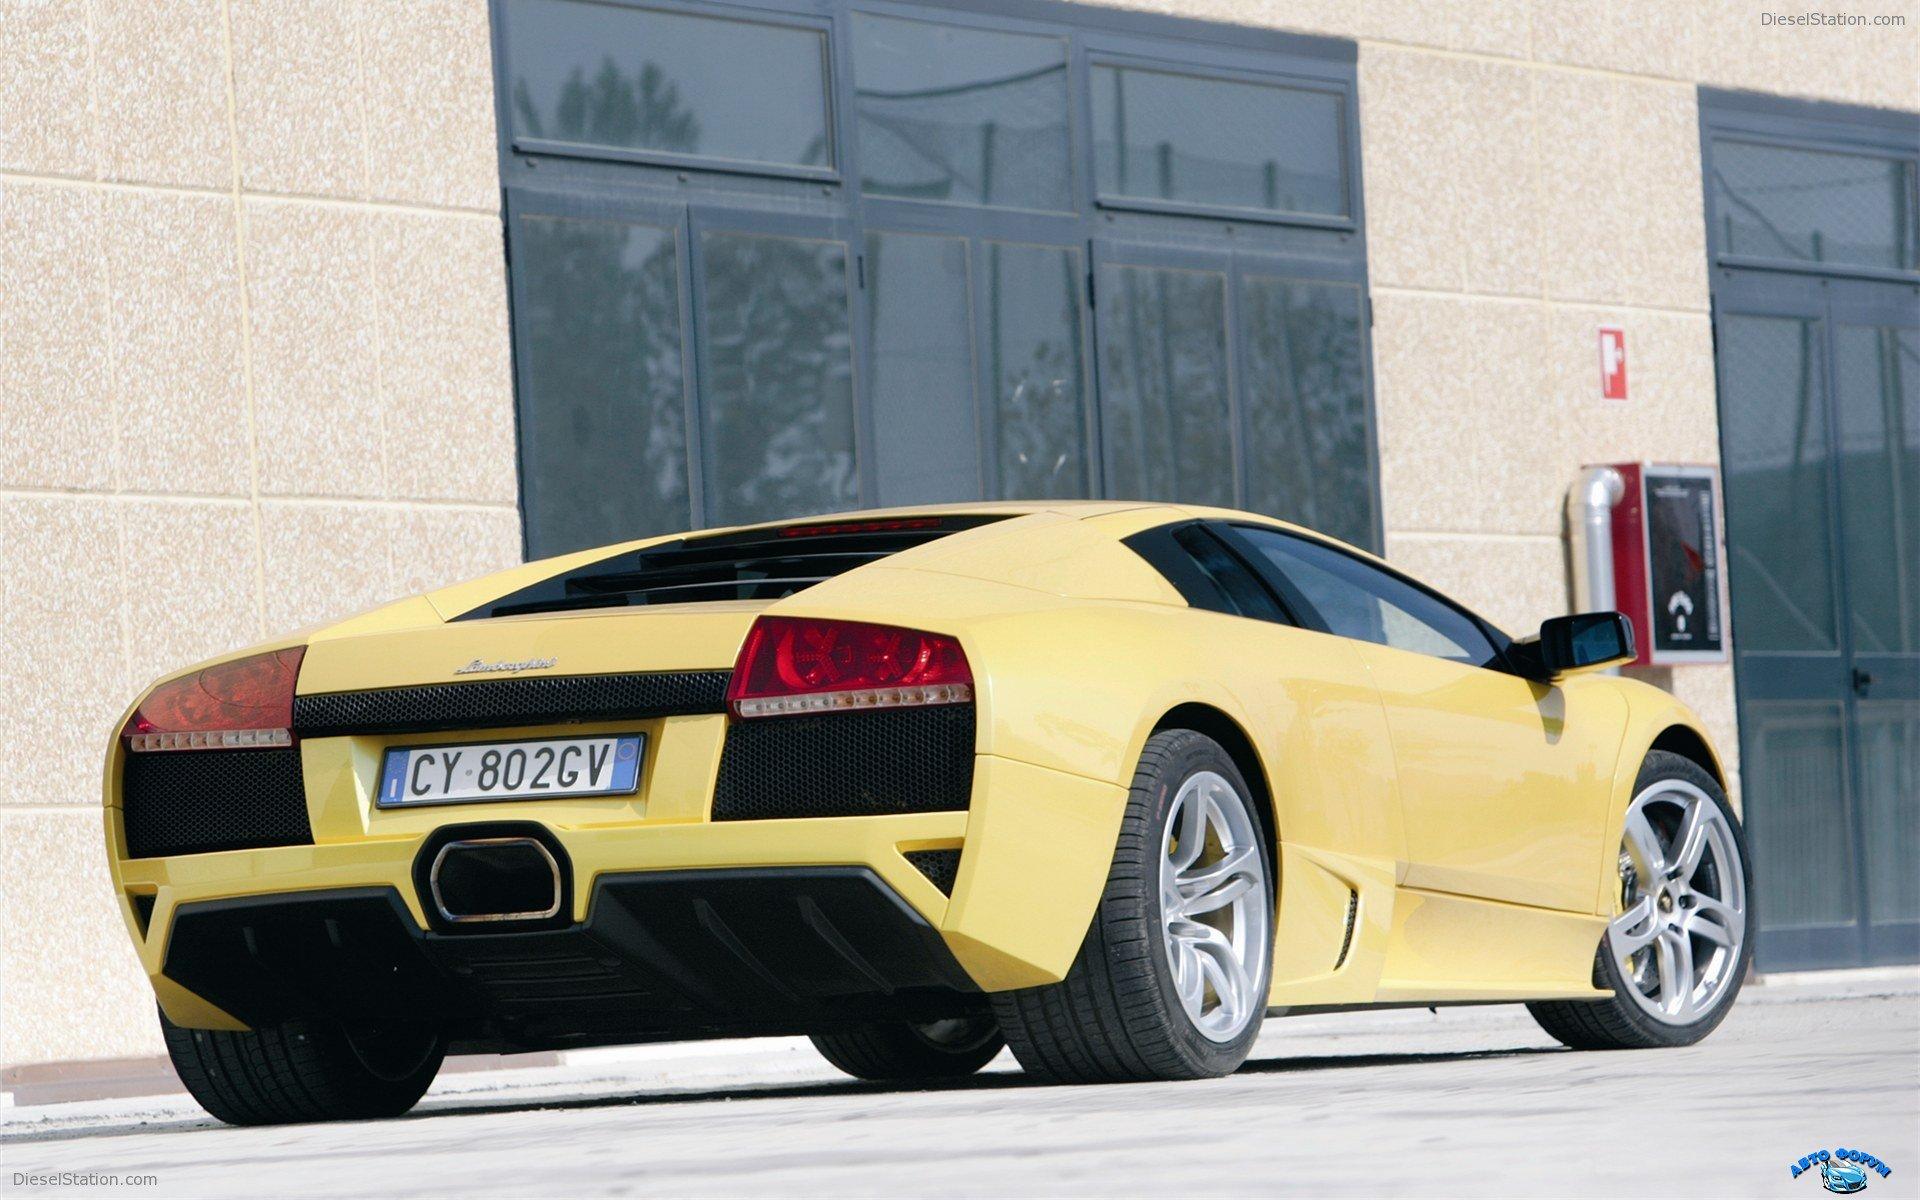 Lamborghini-Murci-lago-LP640-2006-widescreen-22.jpg